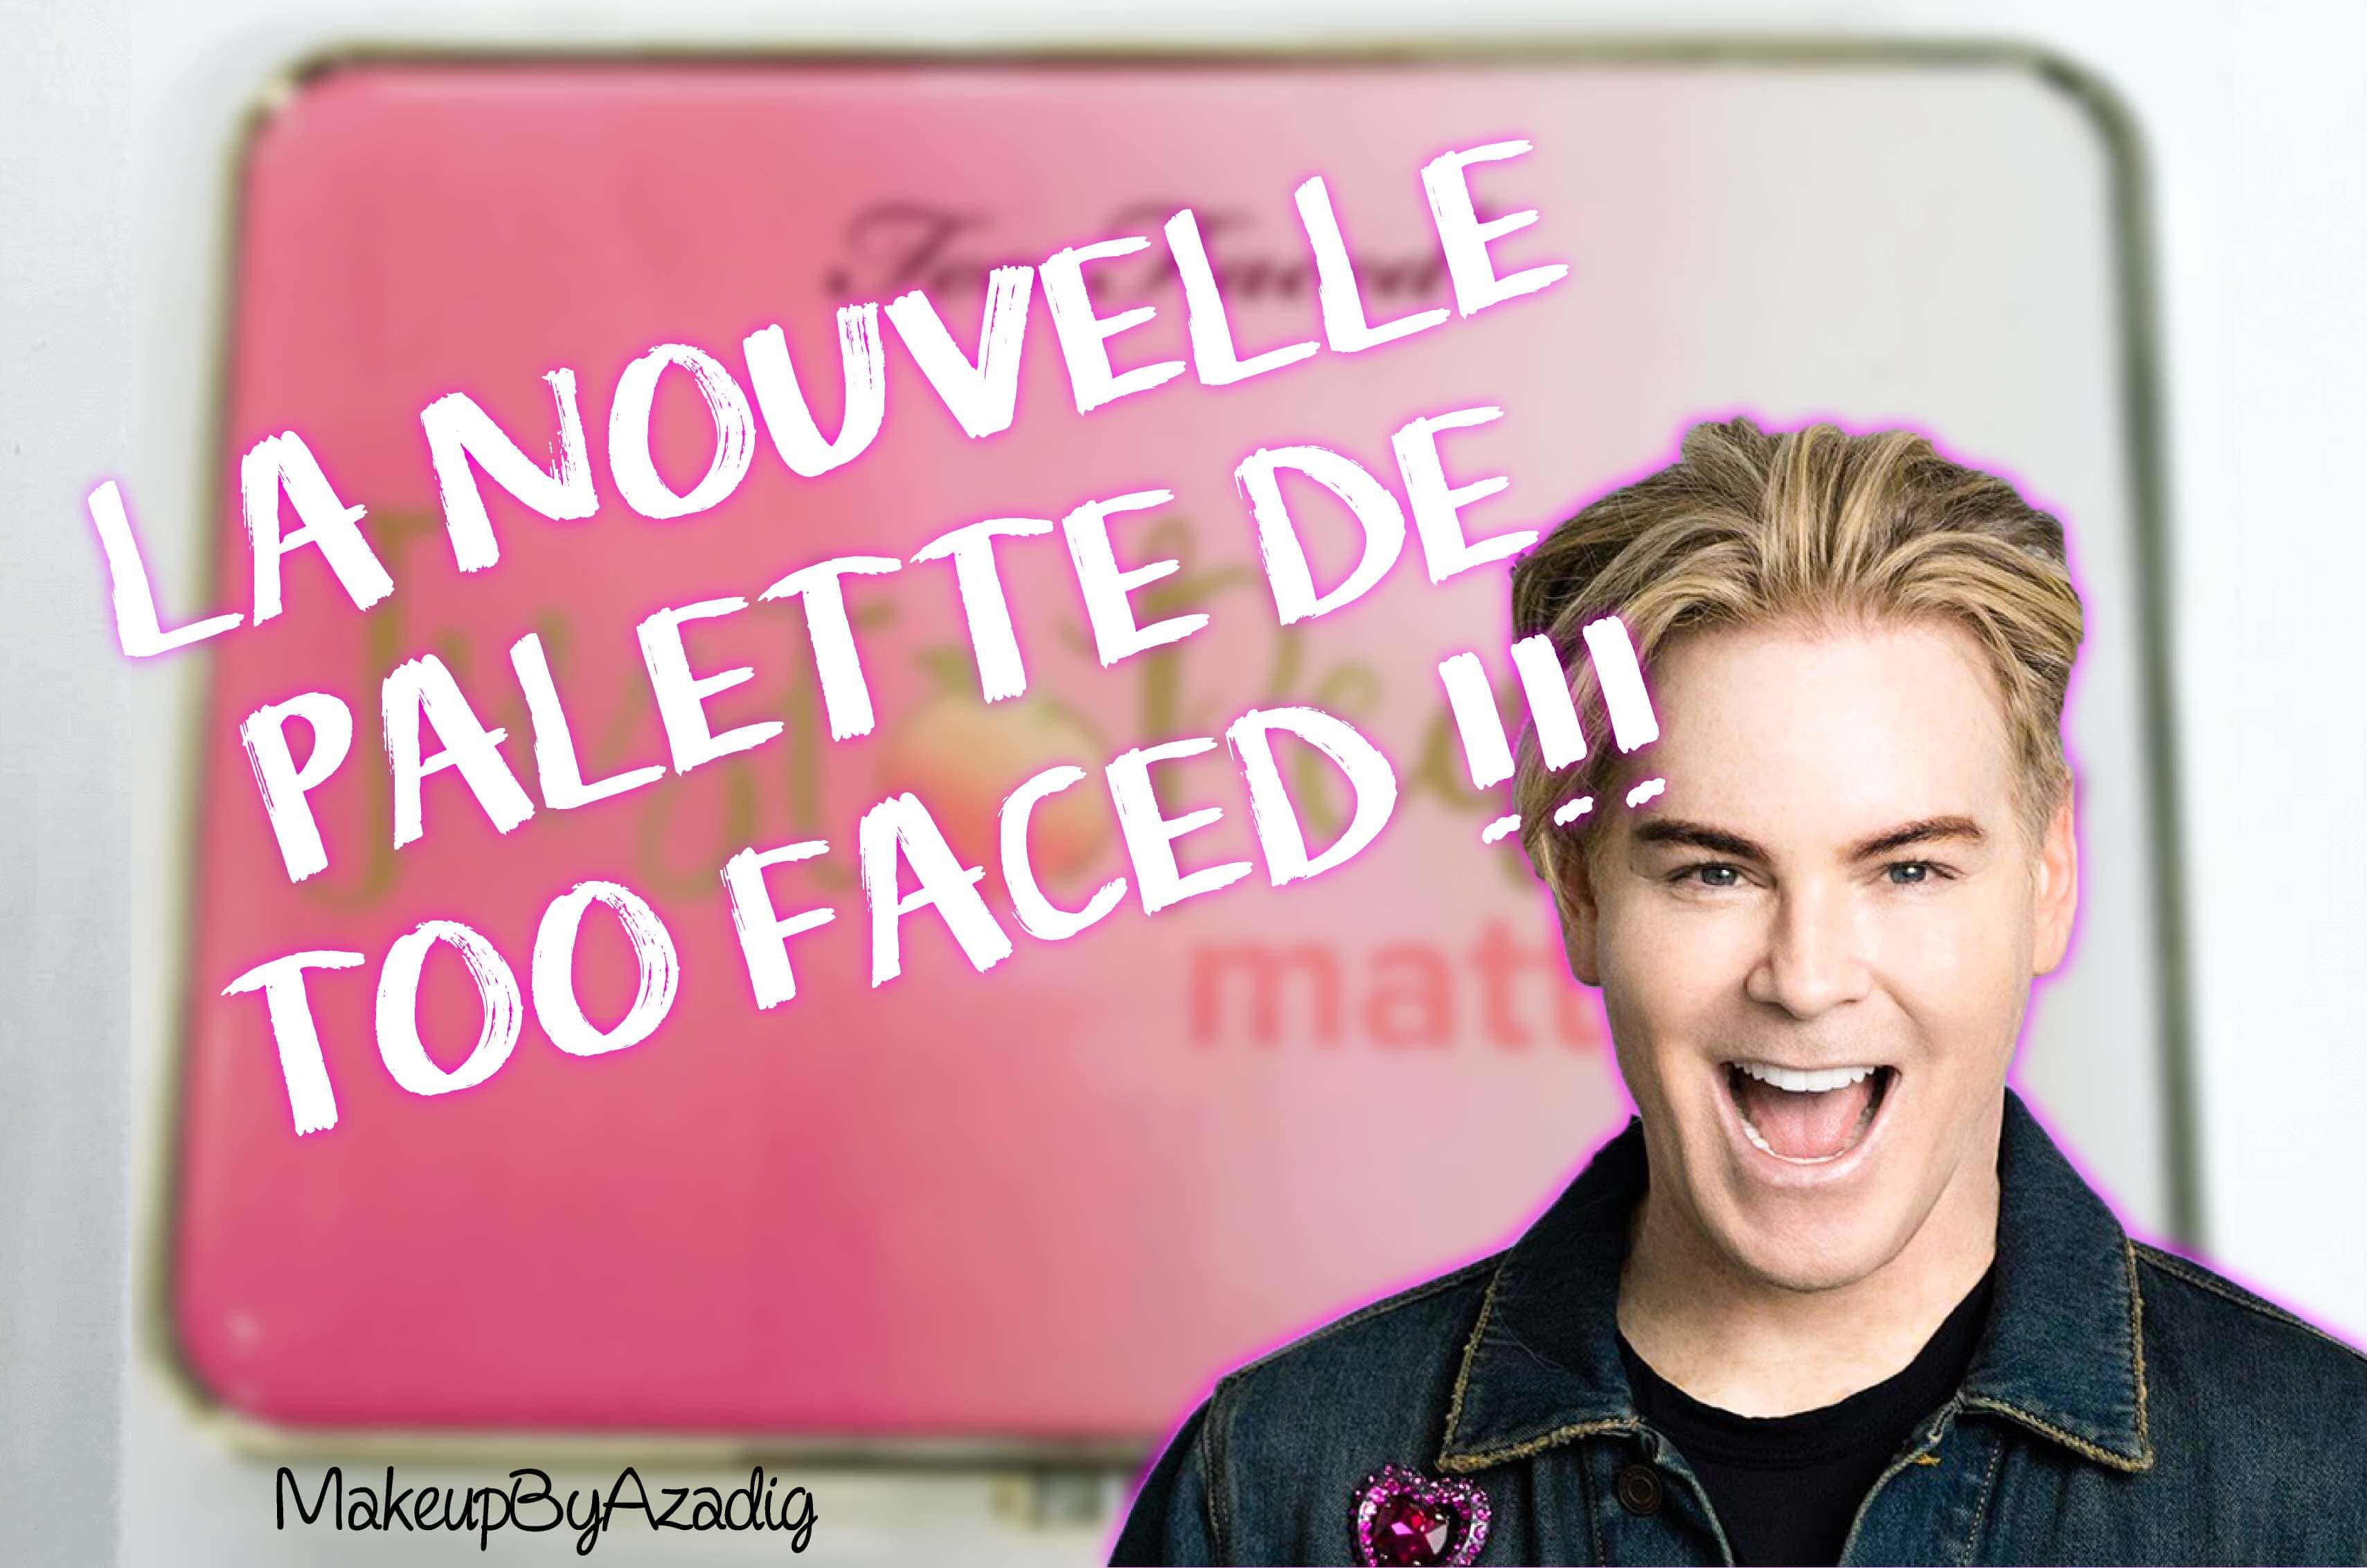 fard-nouvelle-palette-too-faced-just-peachy-mattes-jerrod-blandino-makeupbyazadig